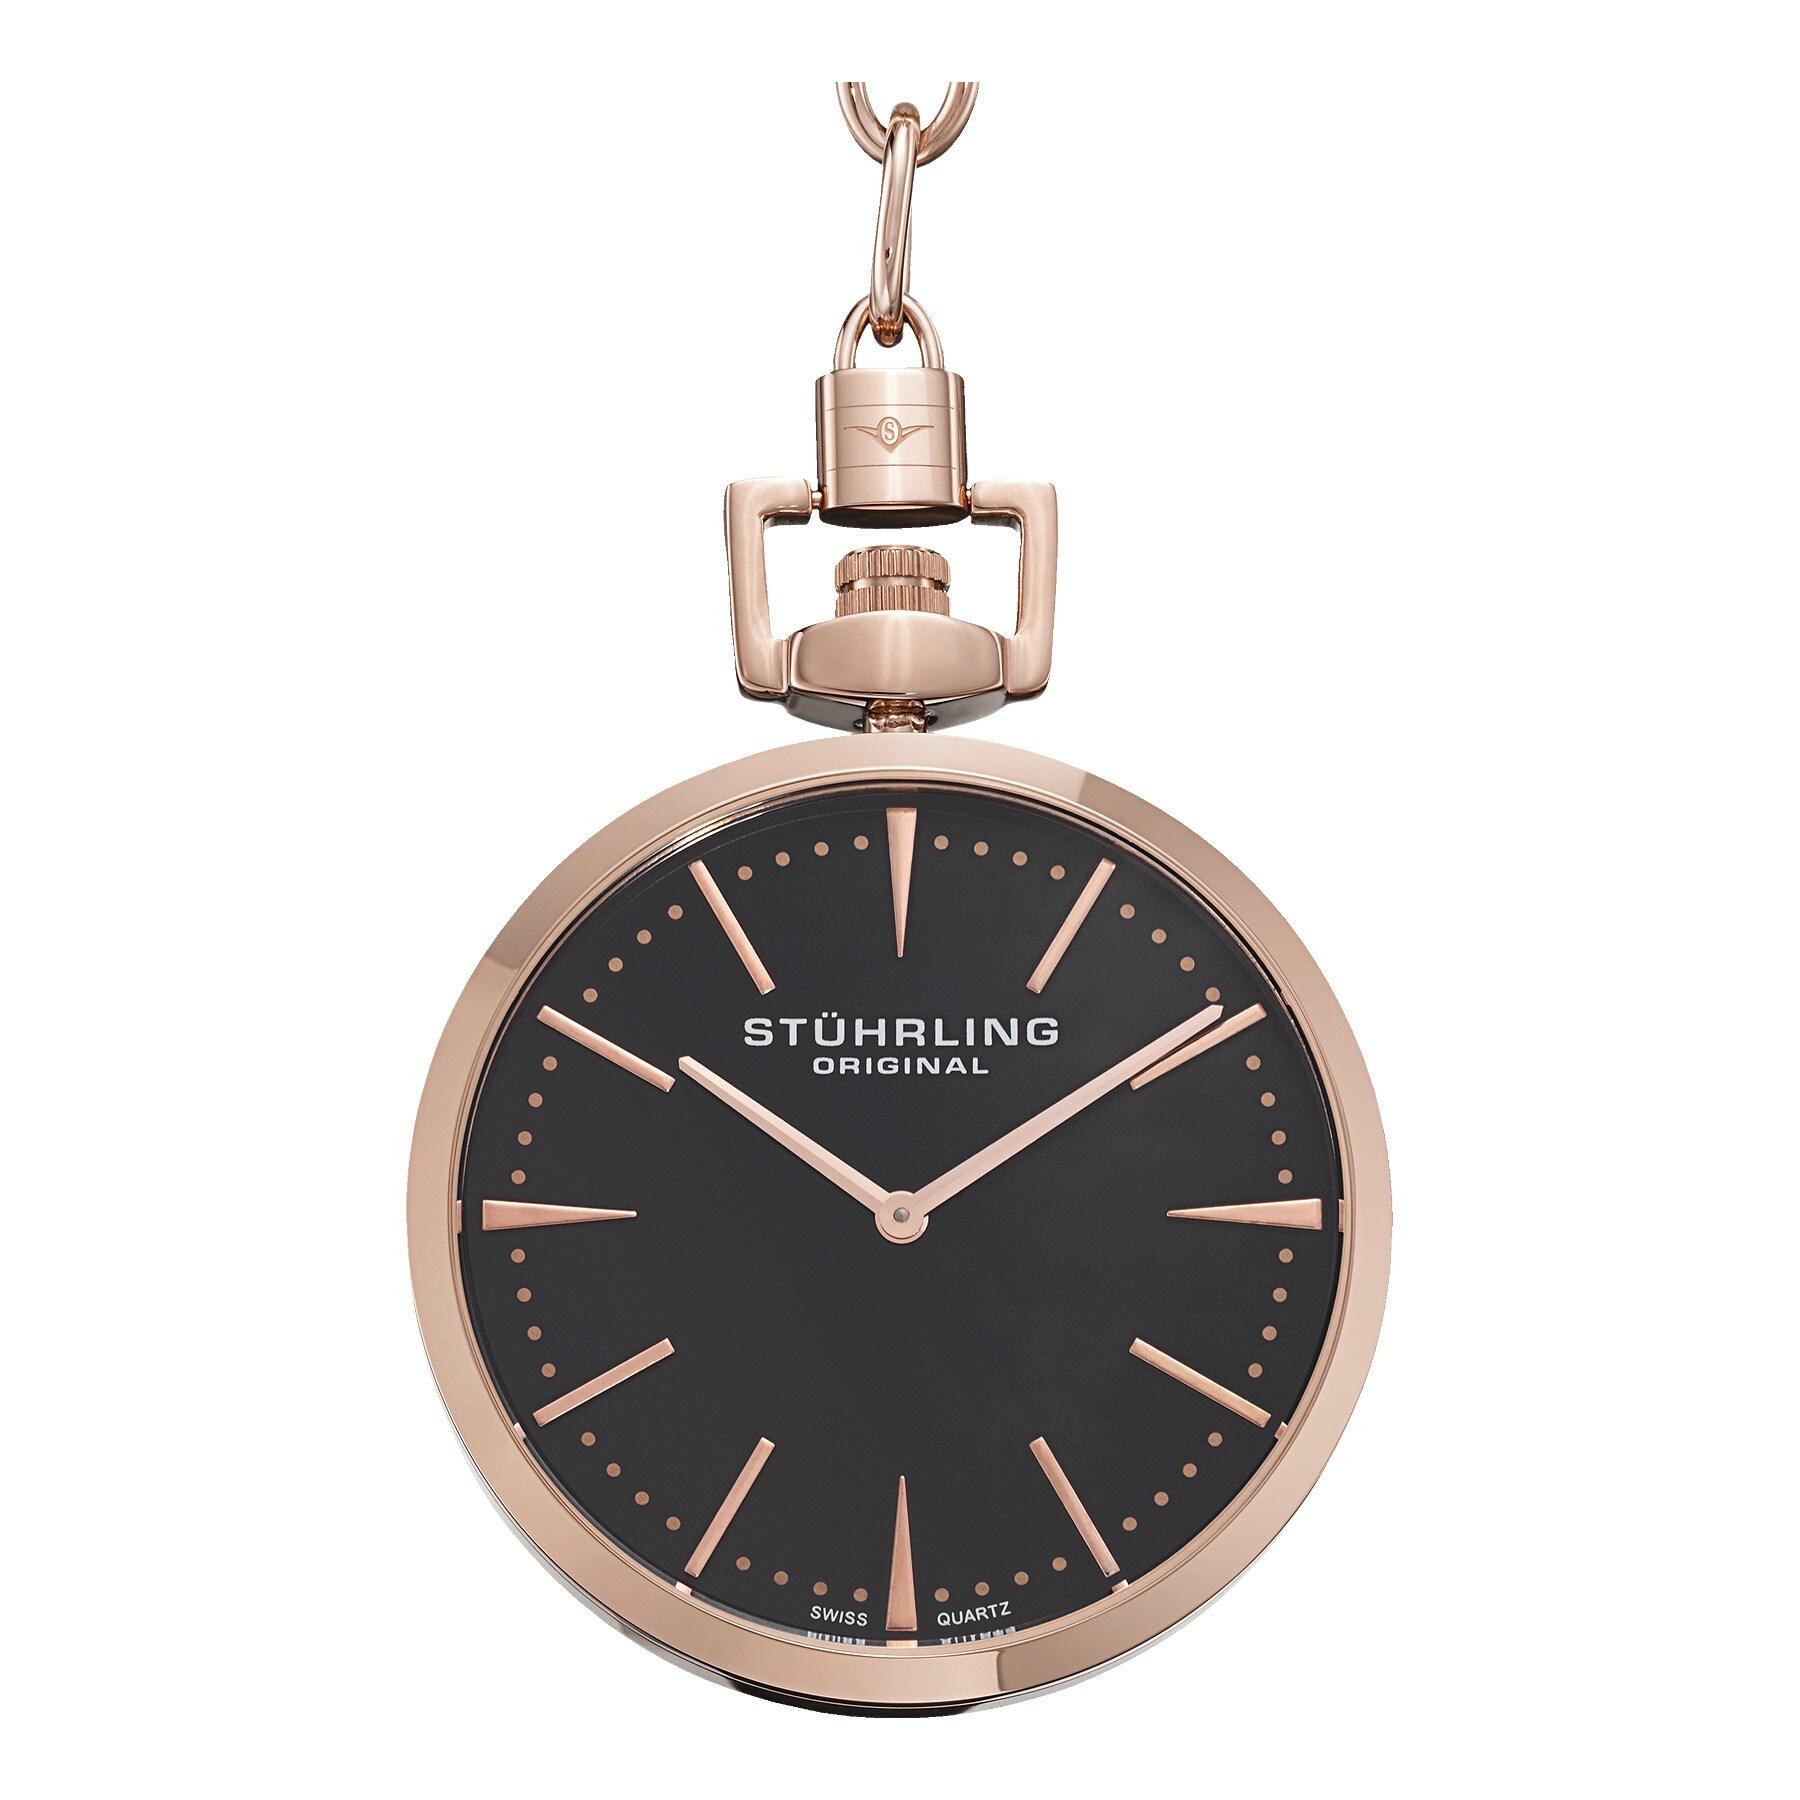 4725f9553 Shop Stuhrling Original Men's Swiss Quartz Symphony Rose-Tone Pocket Watch  - Free Shipping Today - Overstock - 14406092